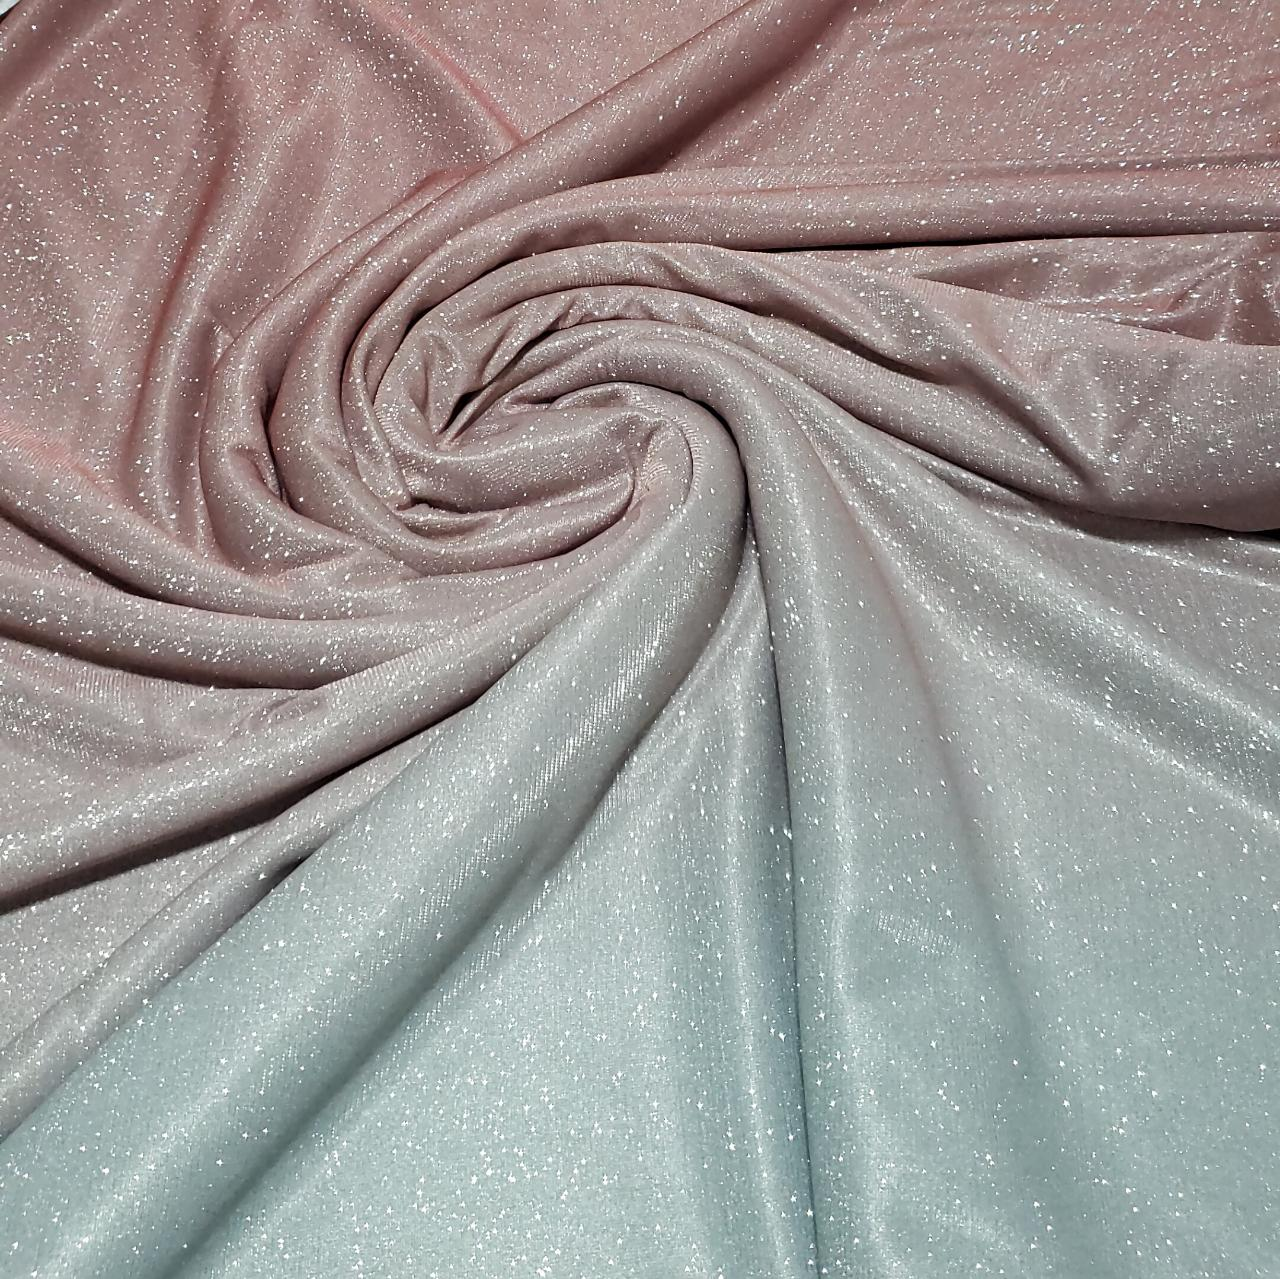 Lurex com Glitter Degradê Rosê com Prata